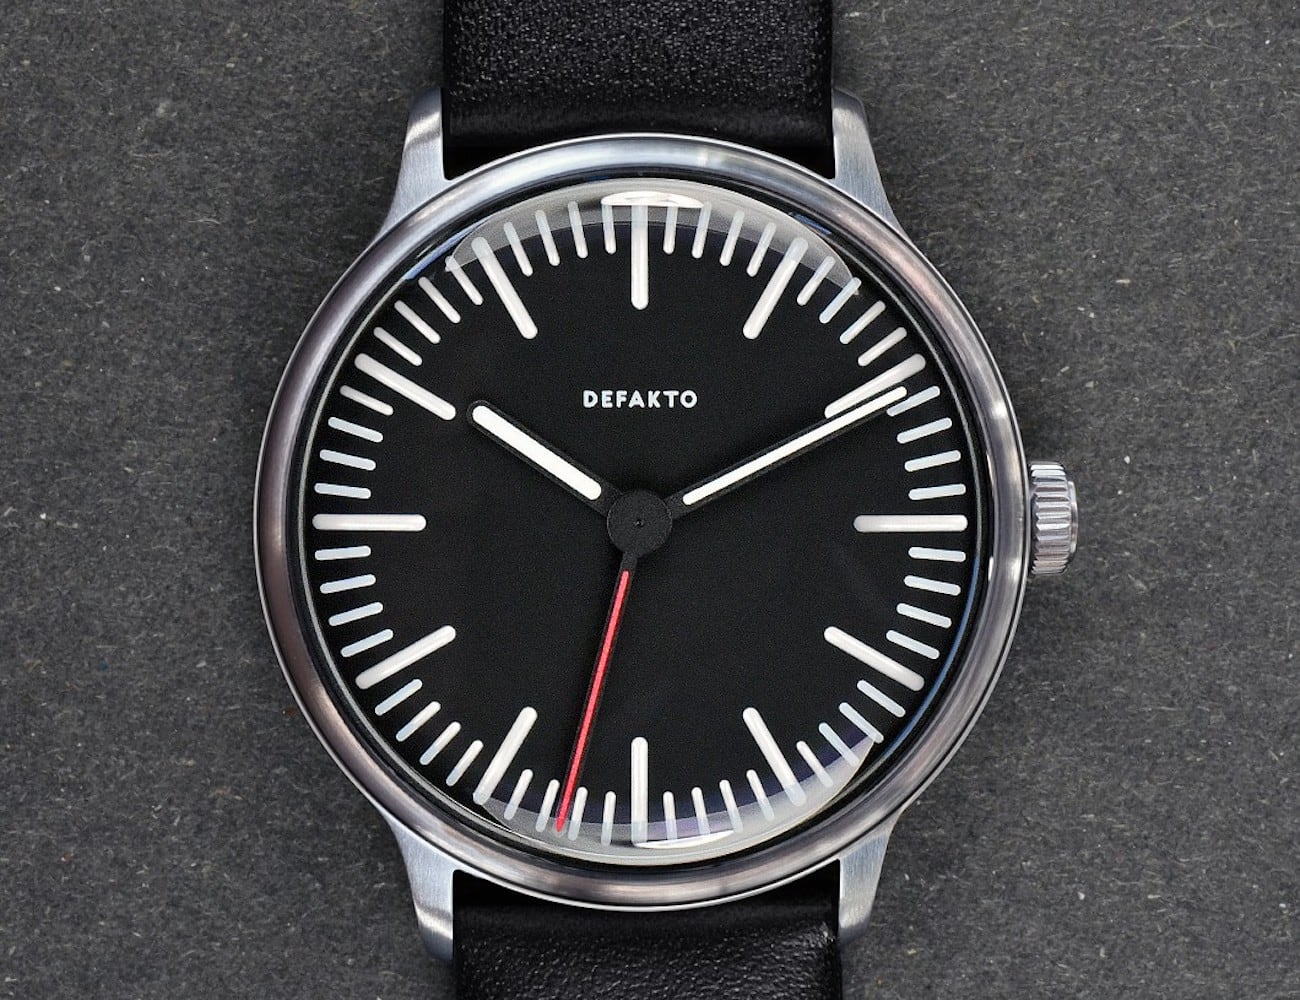 Defakto Transit Standard Thin Modern Watch is just 9.8 millimeters tall